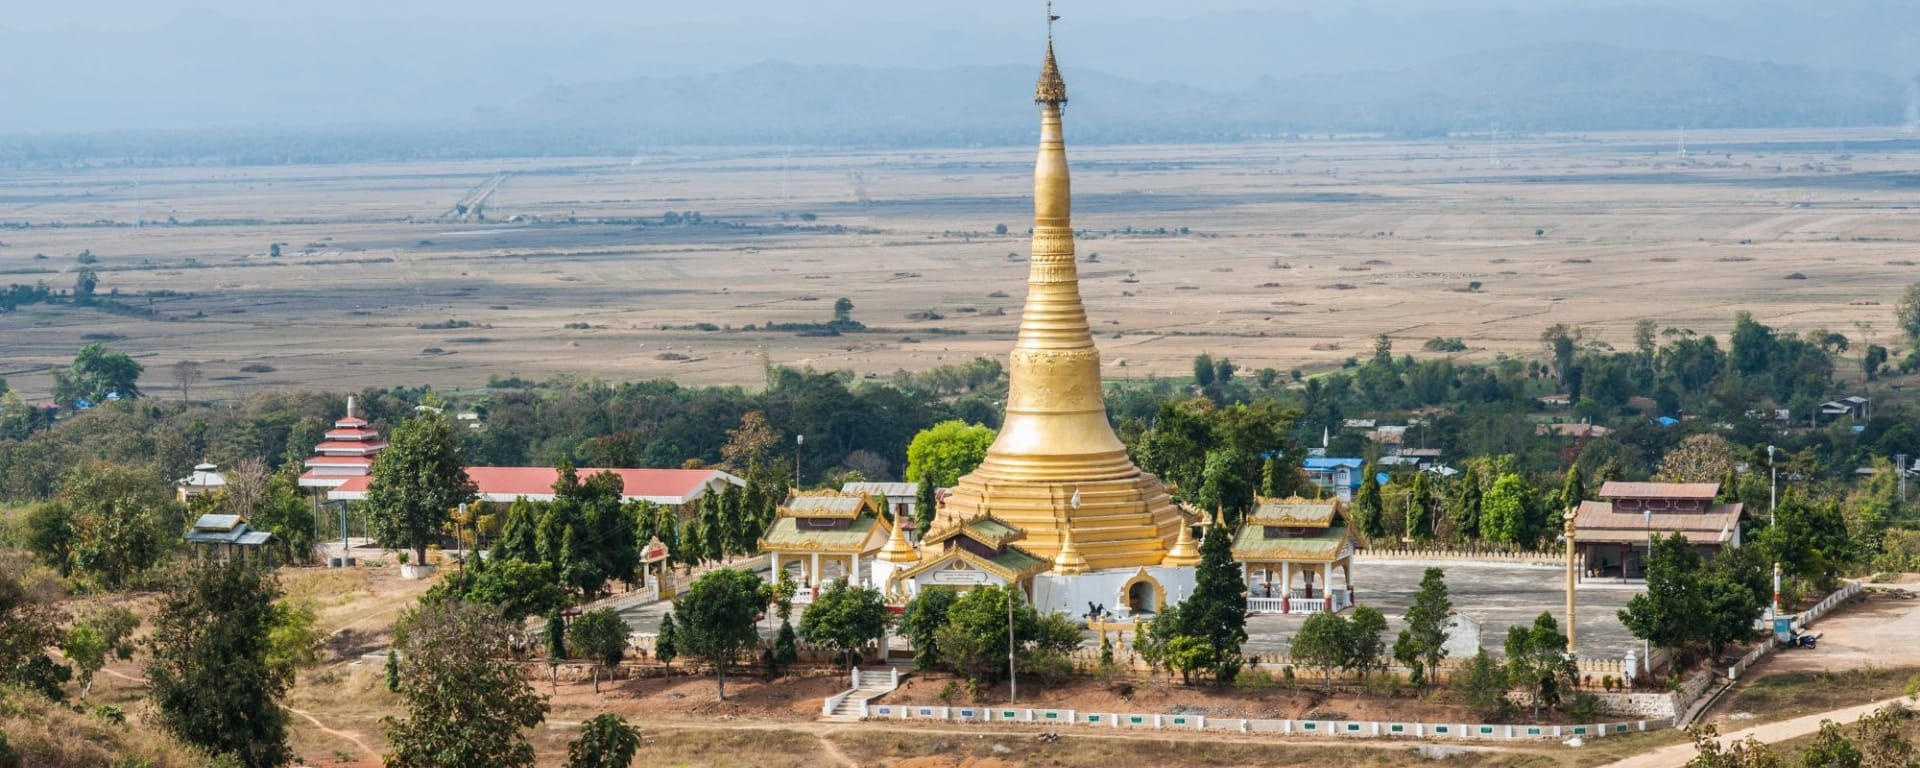 Kayah - Reise in eine verborgene Welt ab Inle Lake: Myanmar Kayah Loikaw Pagoda